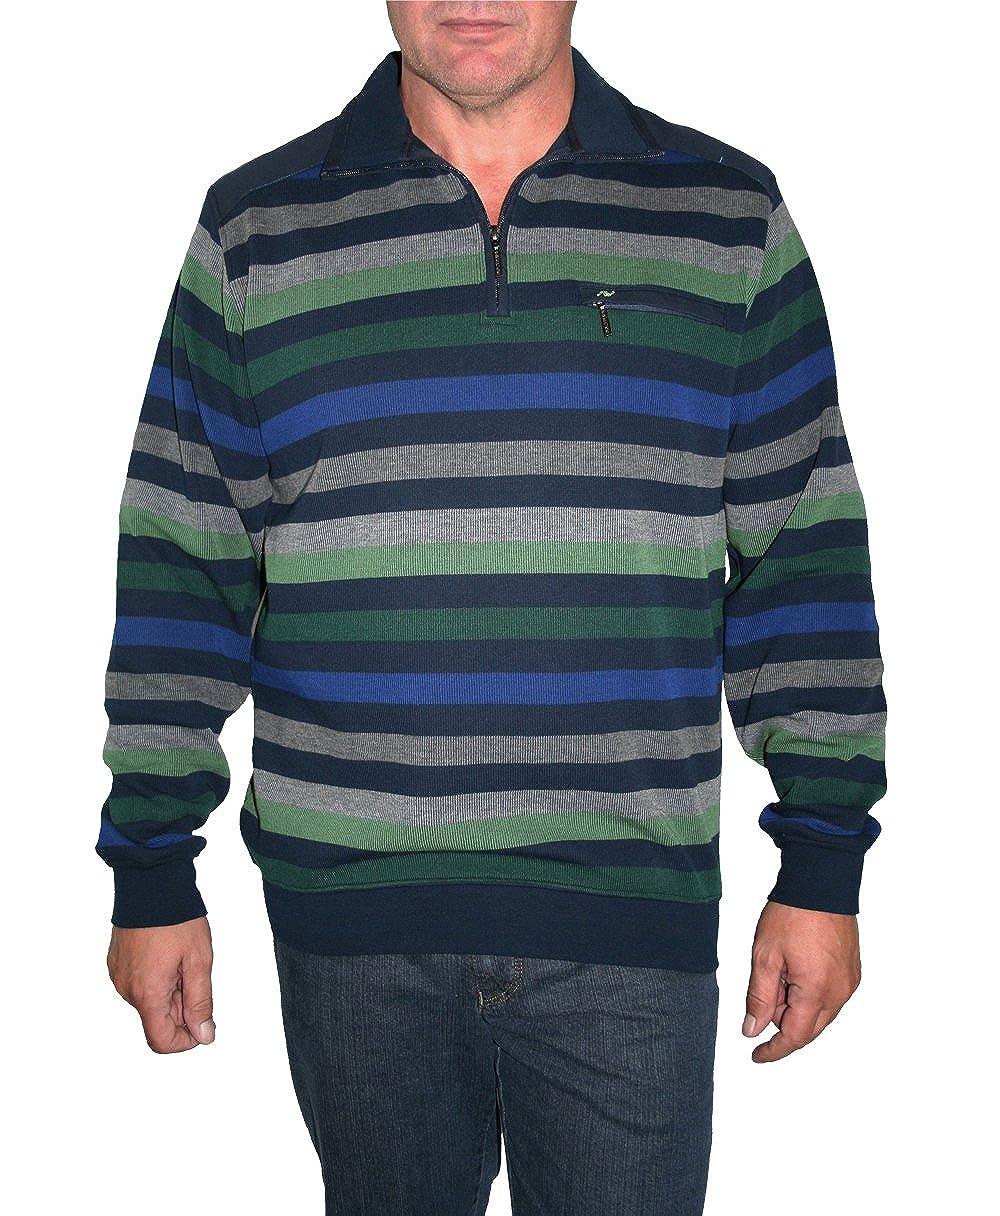 HS Navigazione Sweatshirt Langarm 10523 0005 Marine grün grau gestreift